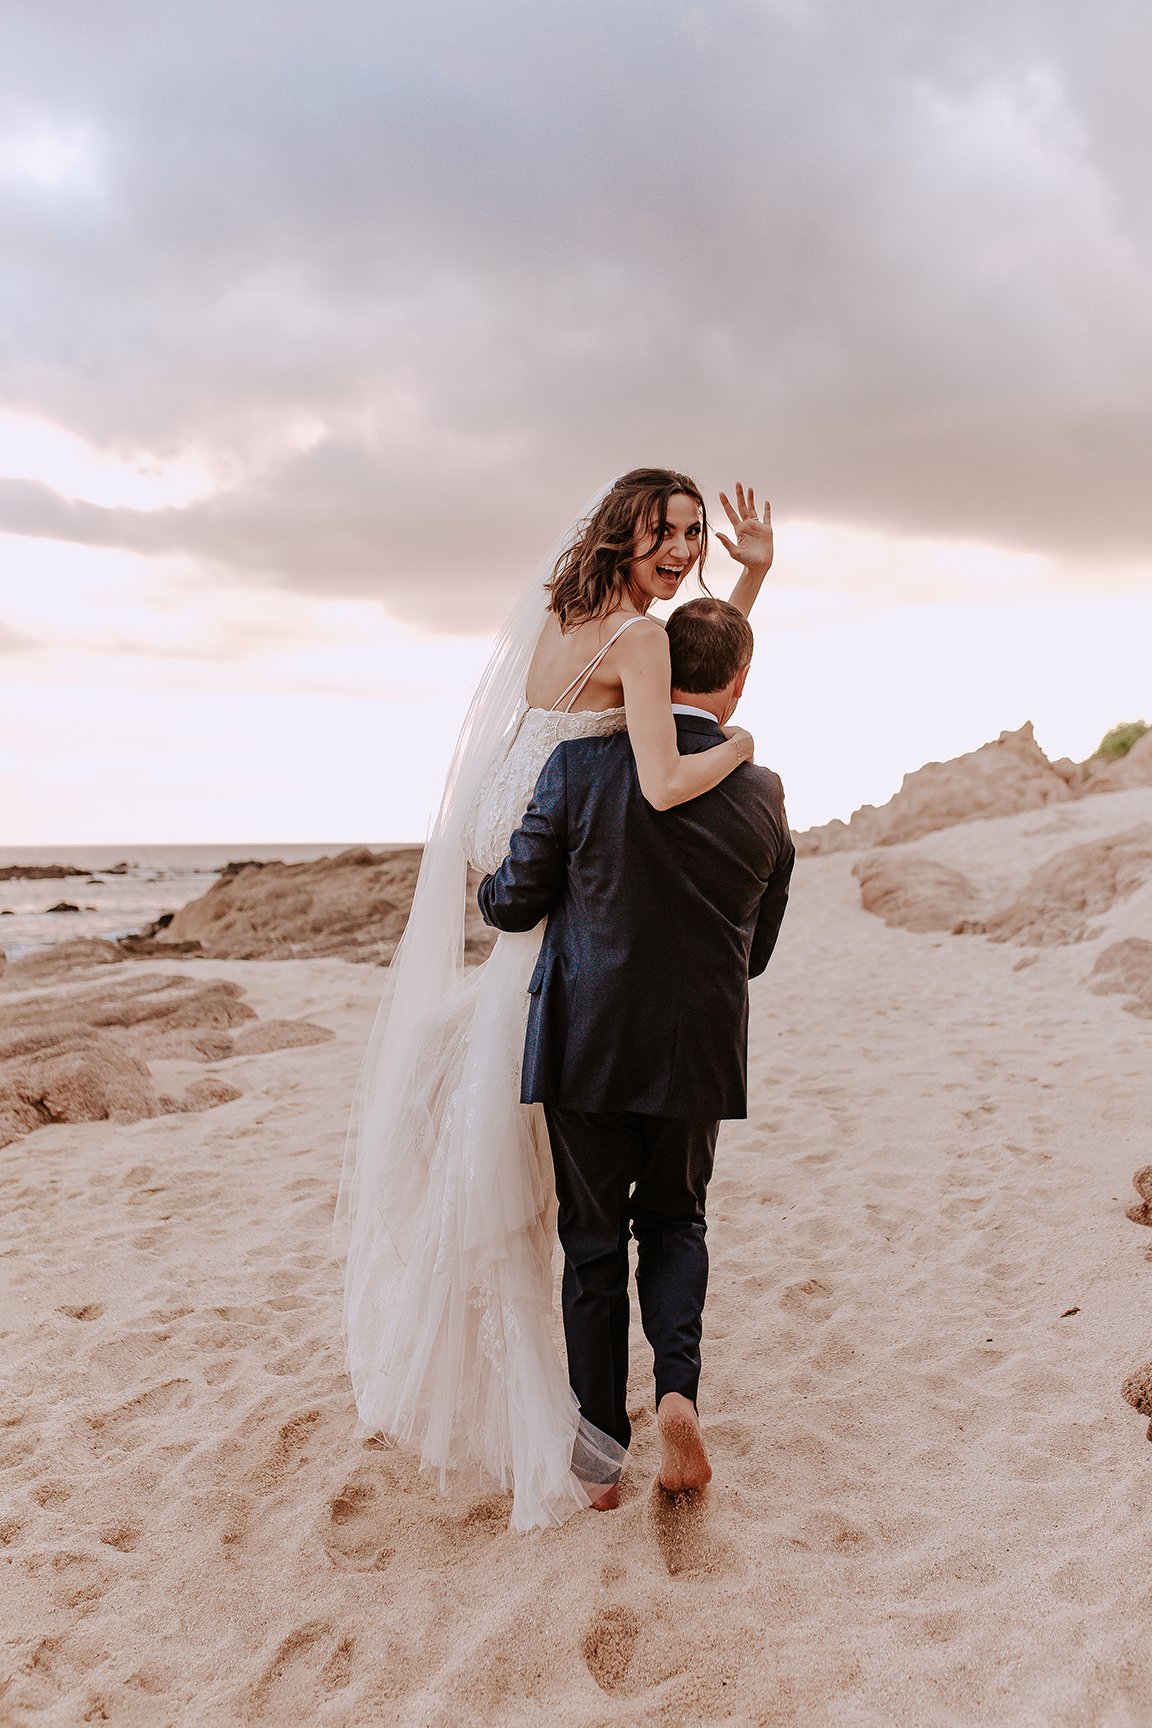 Lindsei+James_cabo_wedding_731.jpg